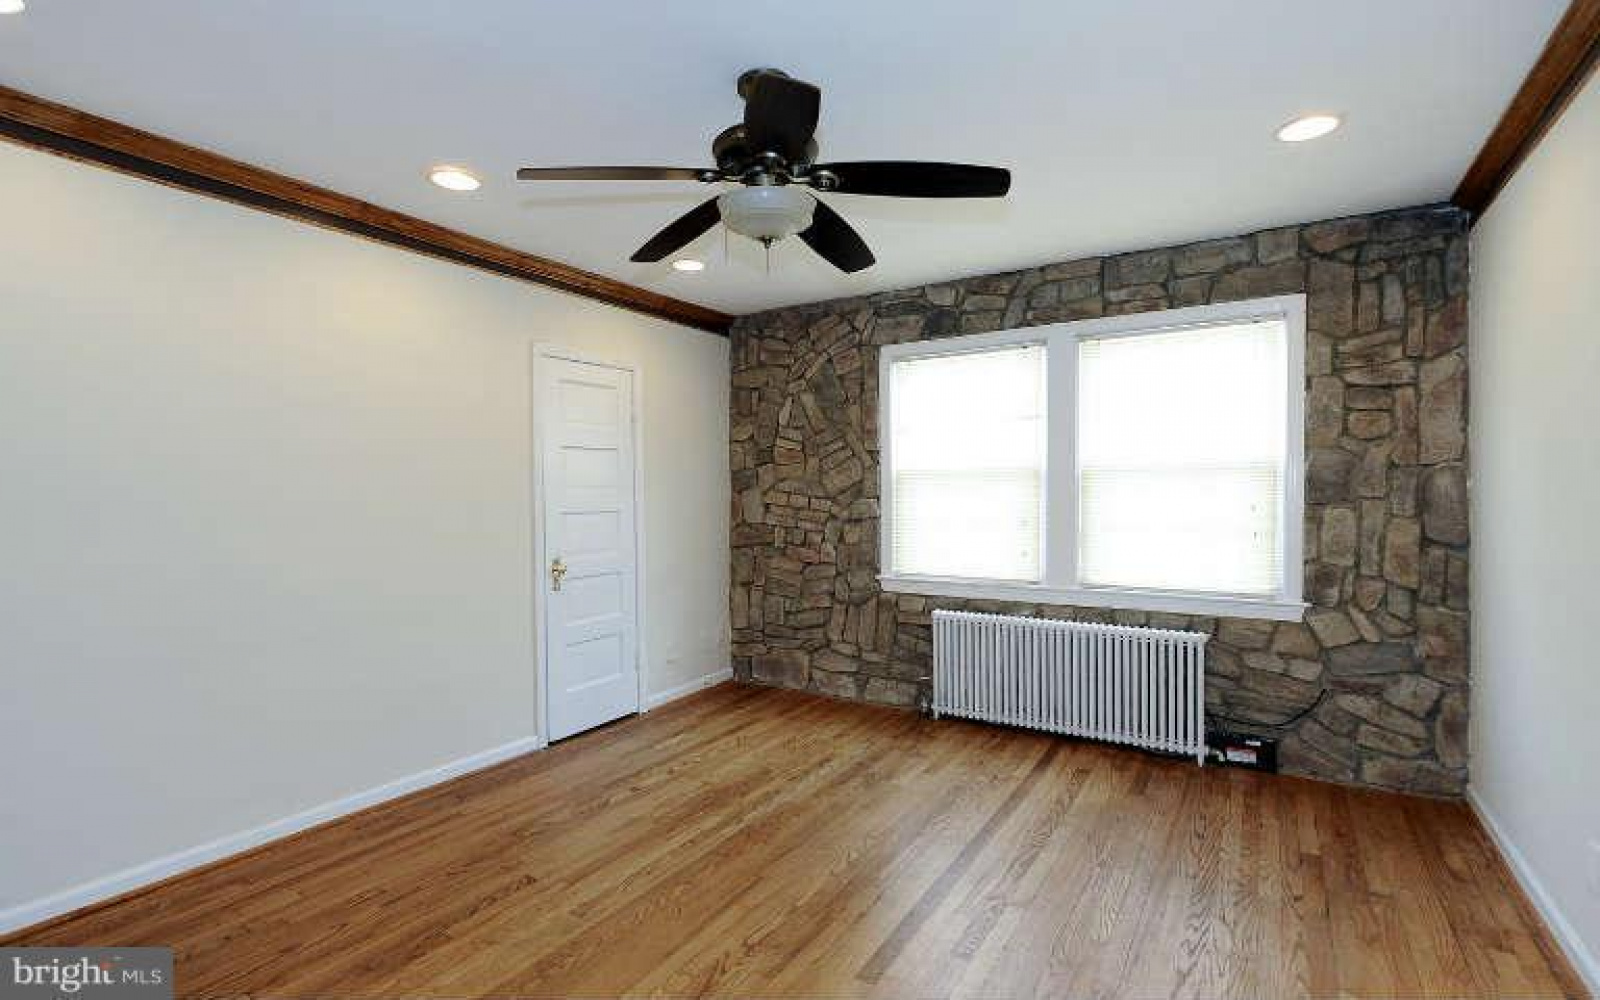 1809 18th St SE,Washington,District Of Columbia 20002,2 Bedrooms Bedrooms,1 BathroomBathrooms,Apartment,18th St,1241